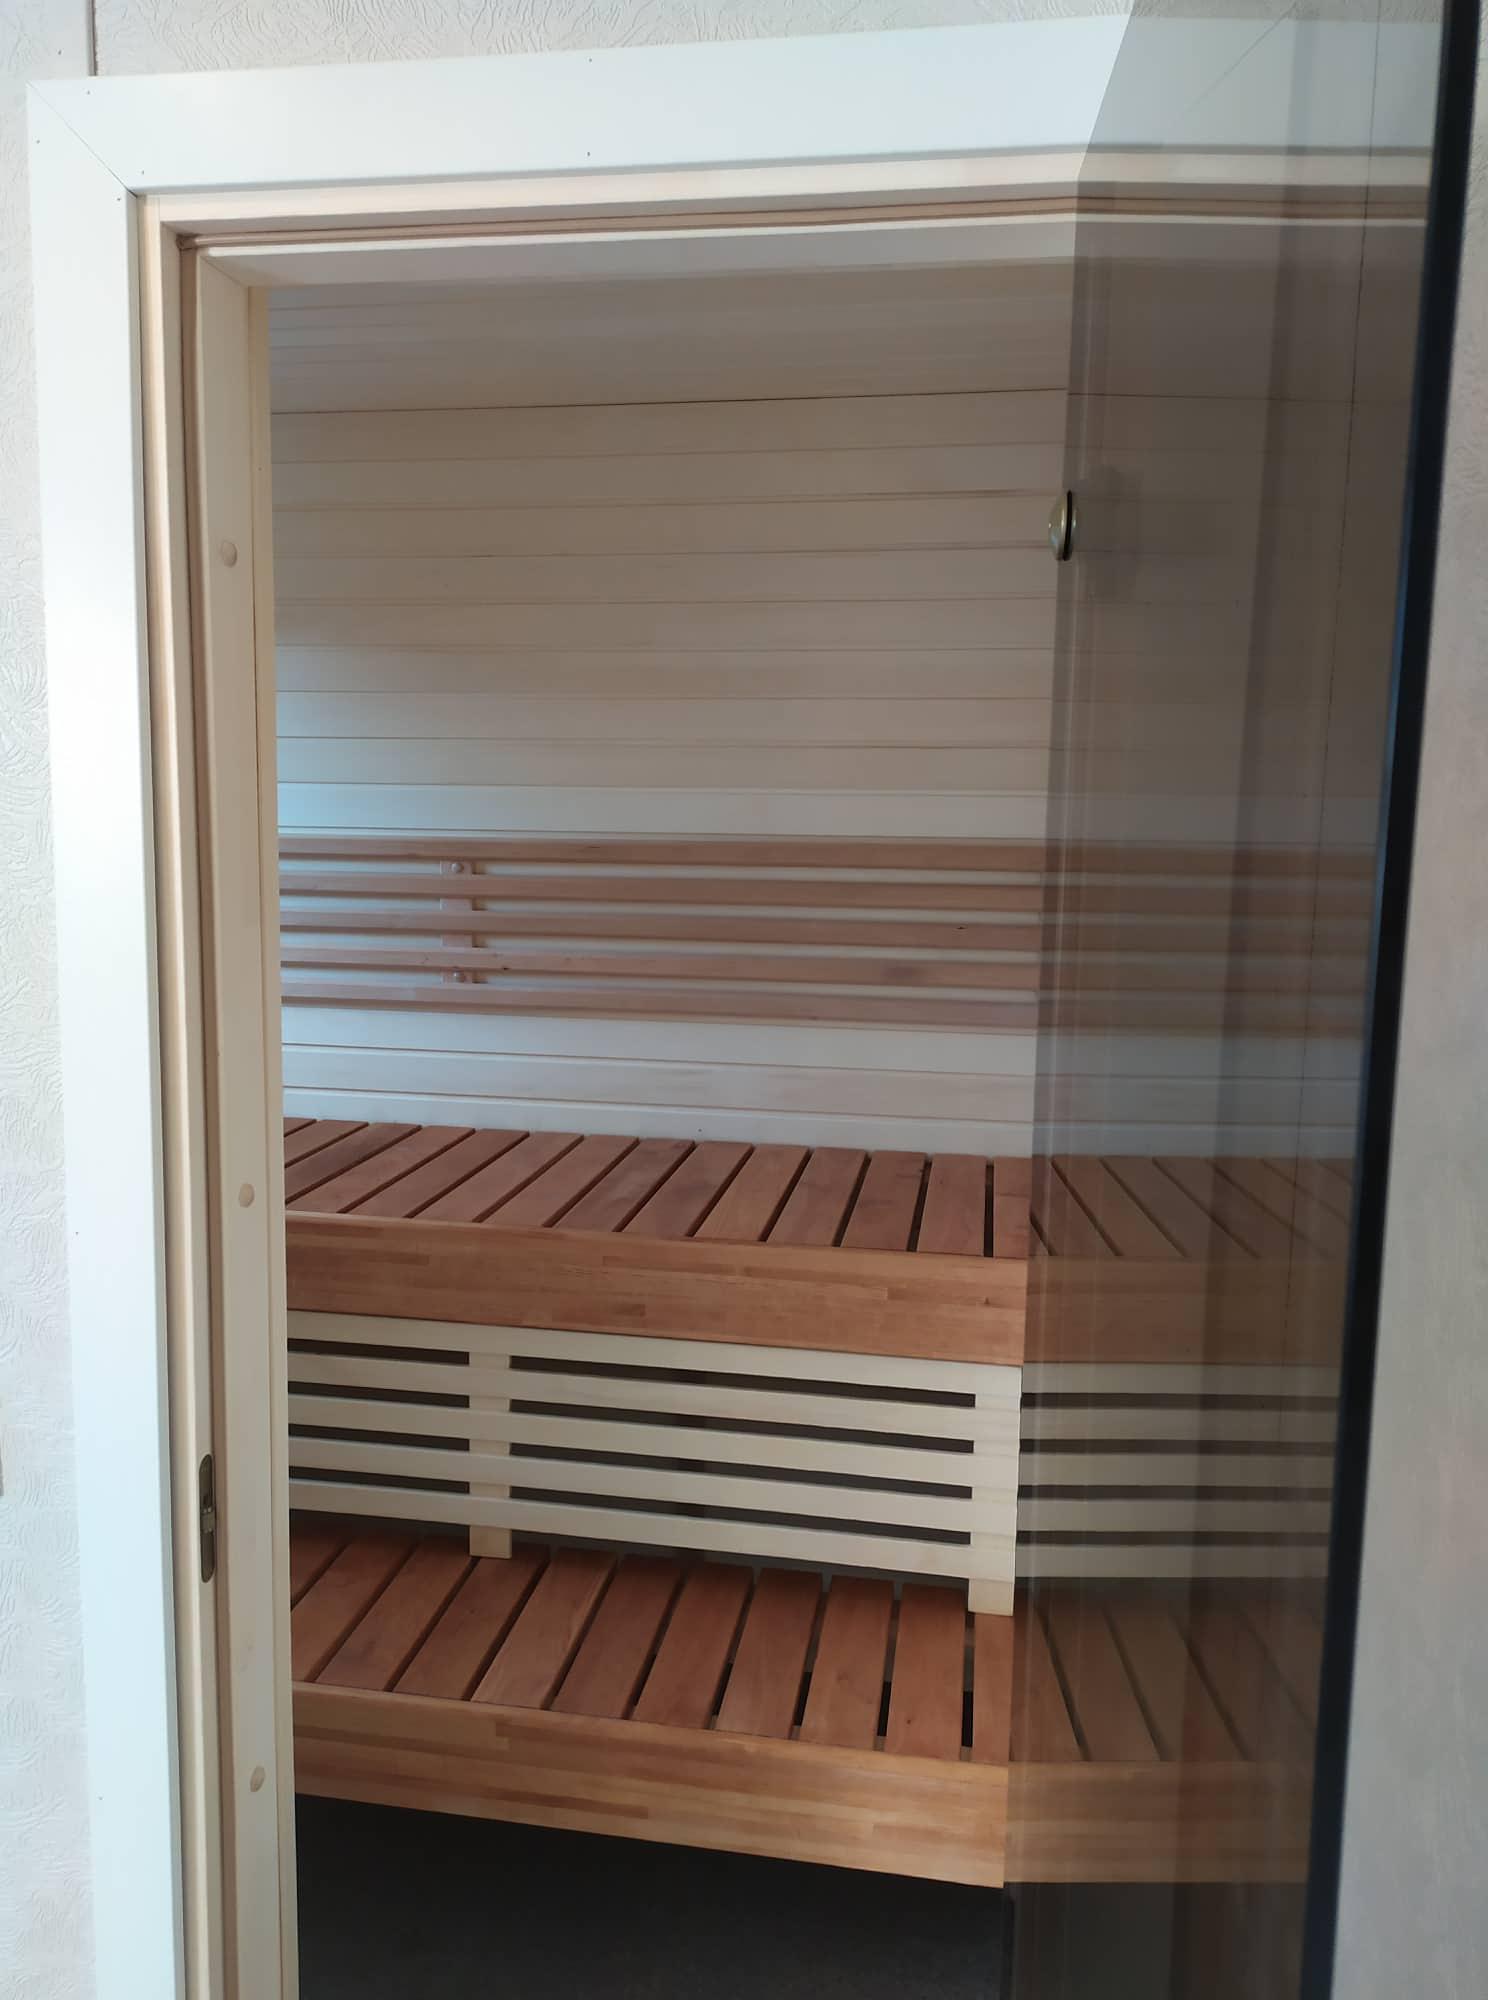 Talovaunu-sauna-mökki-saunamökki-takka-kuva-talotehdas-ratastelkodu-mobile-homes-villavagnar-vaiilavagn-talovaunut-elokuu-2019_9.jpg_11.jpg